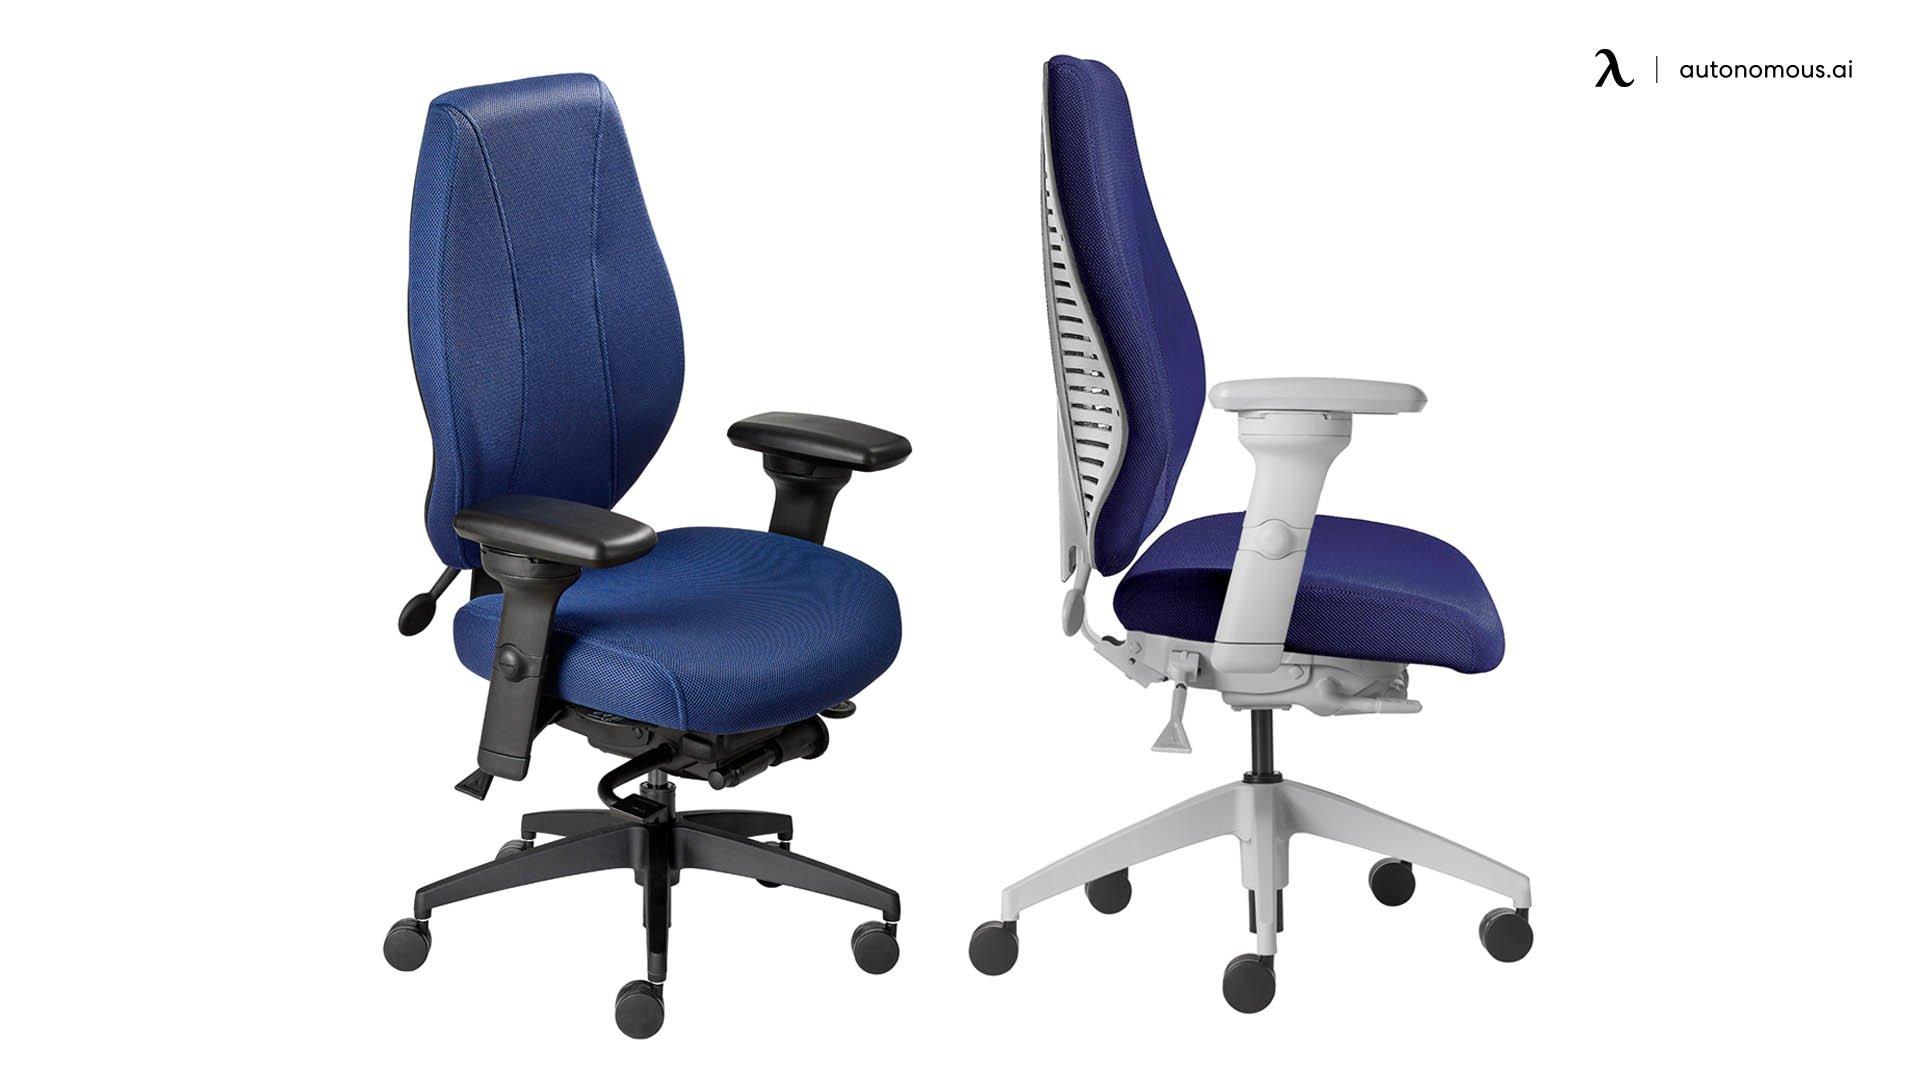 Aircentric Ergonomic Office Chair